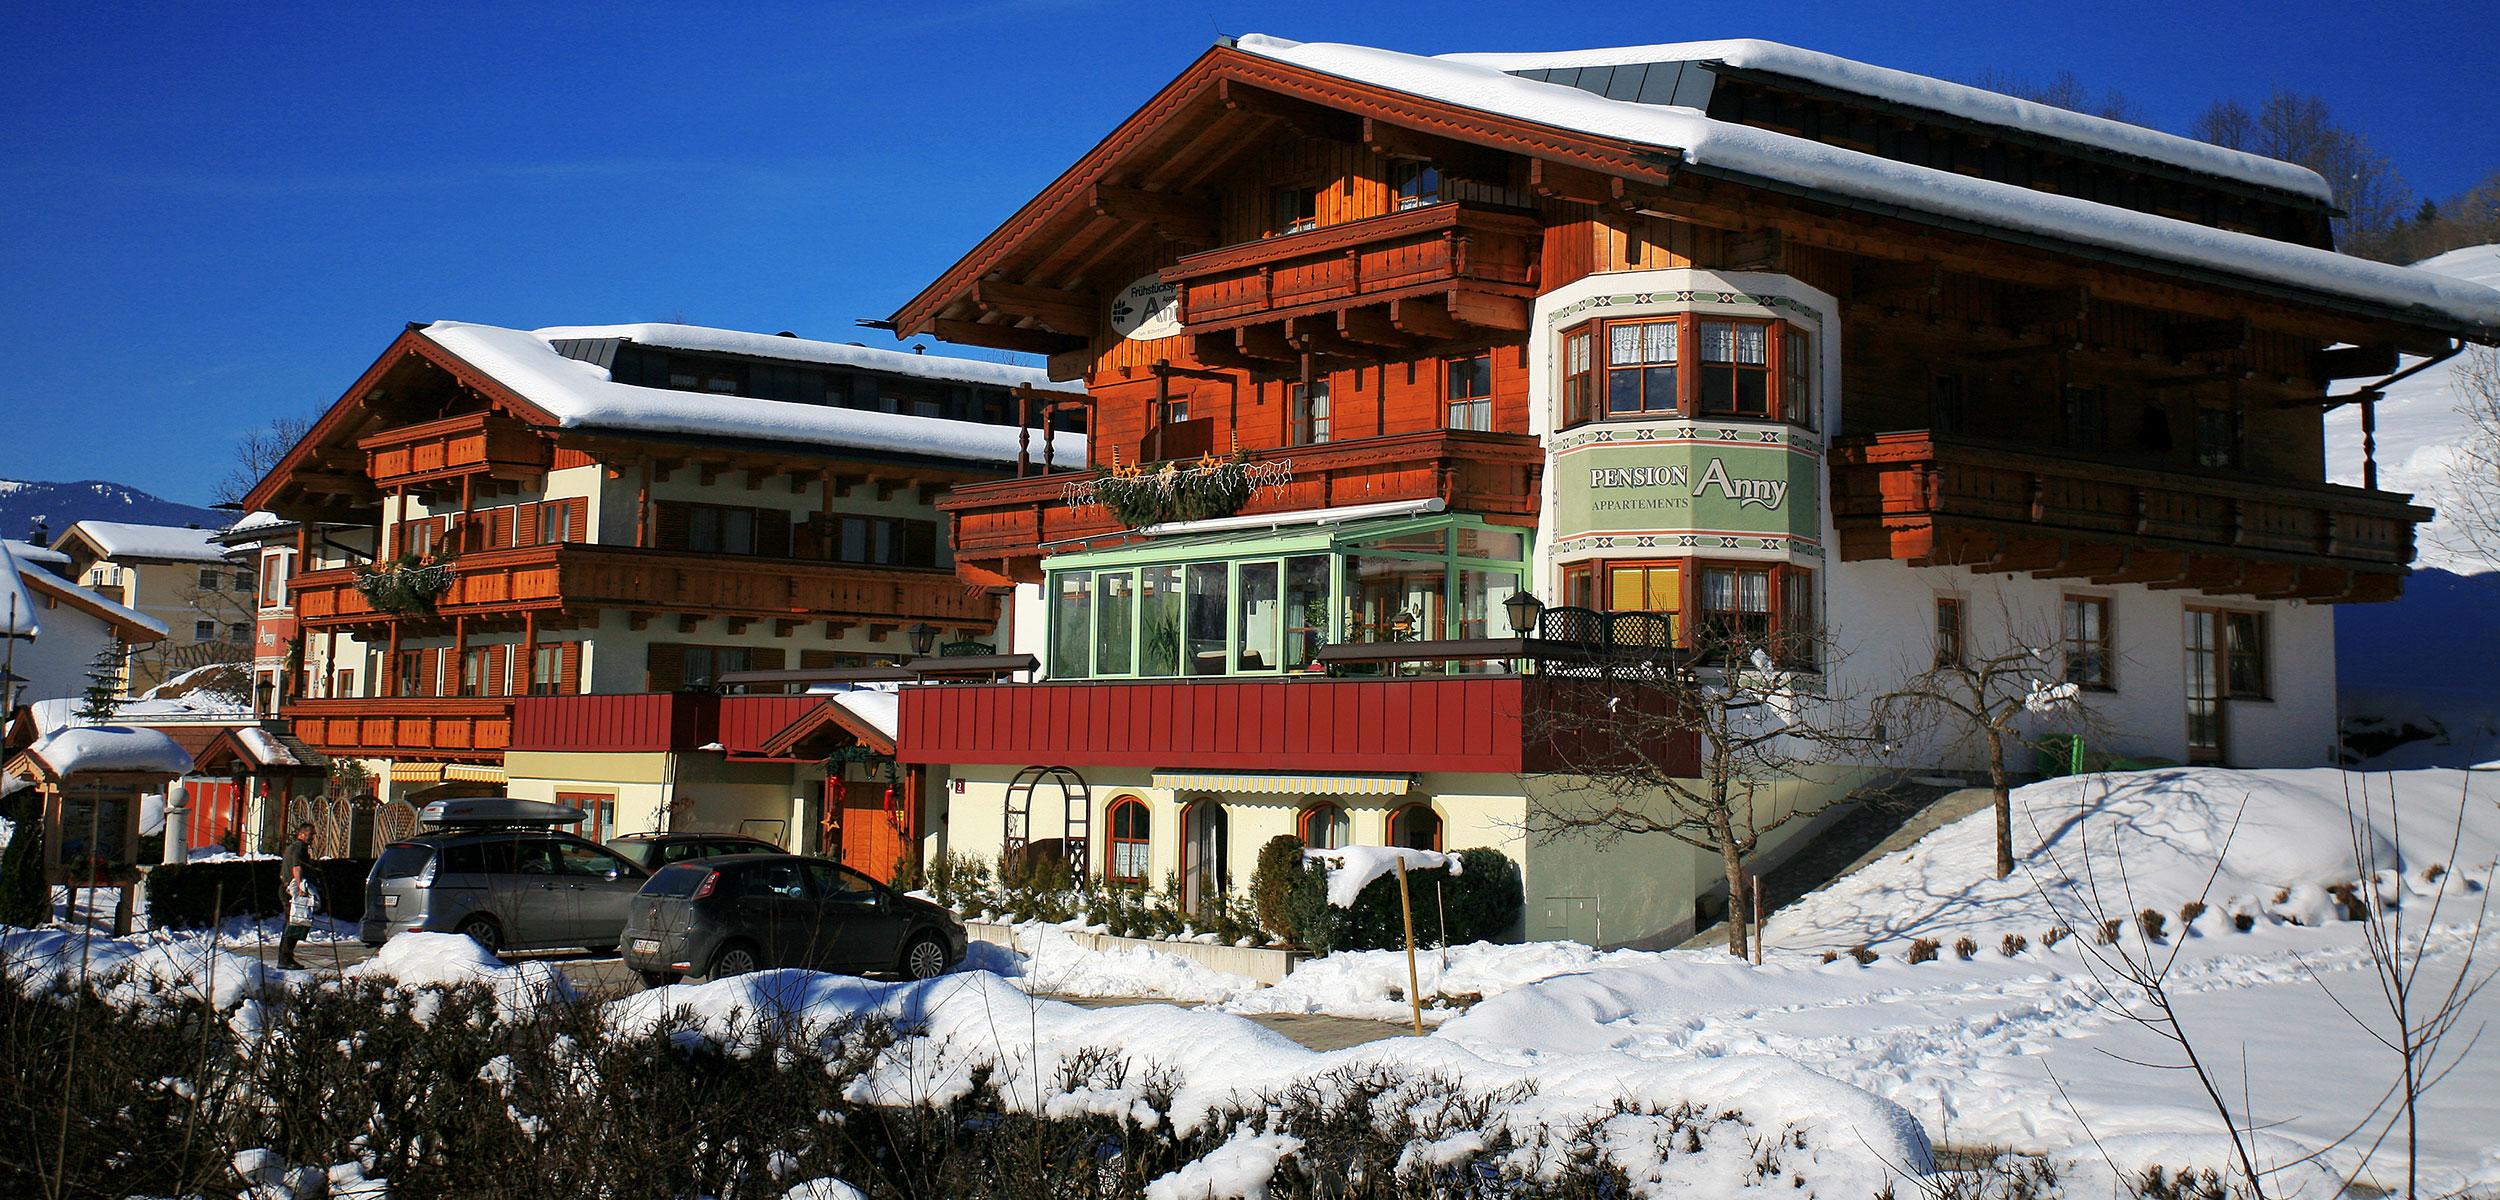 Das Haupthaus - Pension Anny